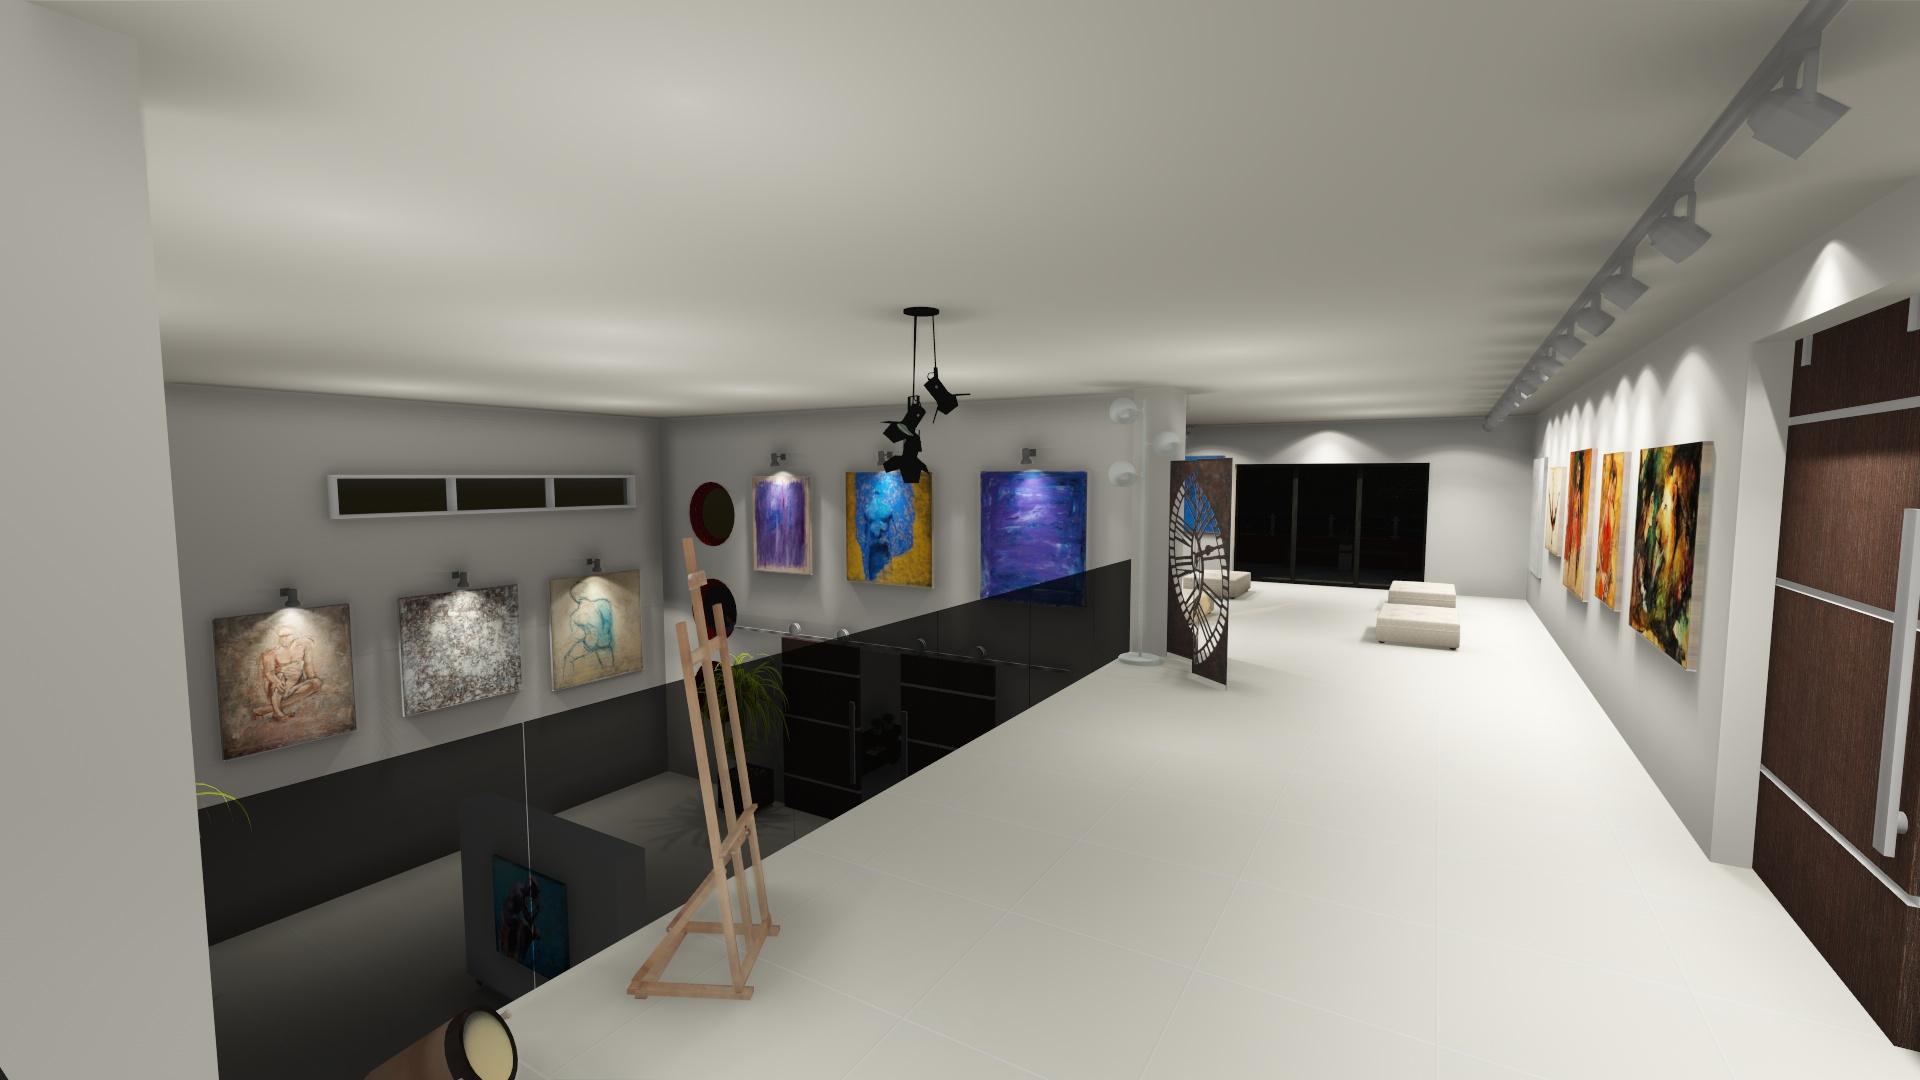 galeria de arte - mezanino